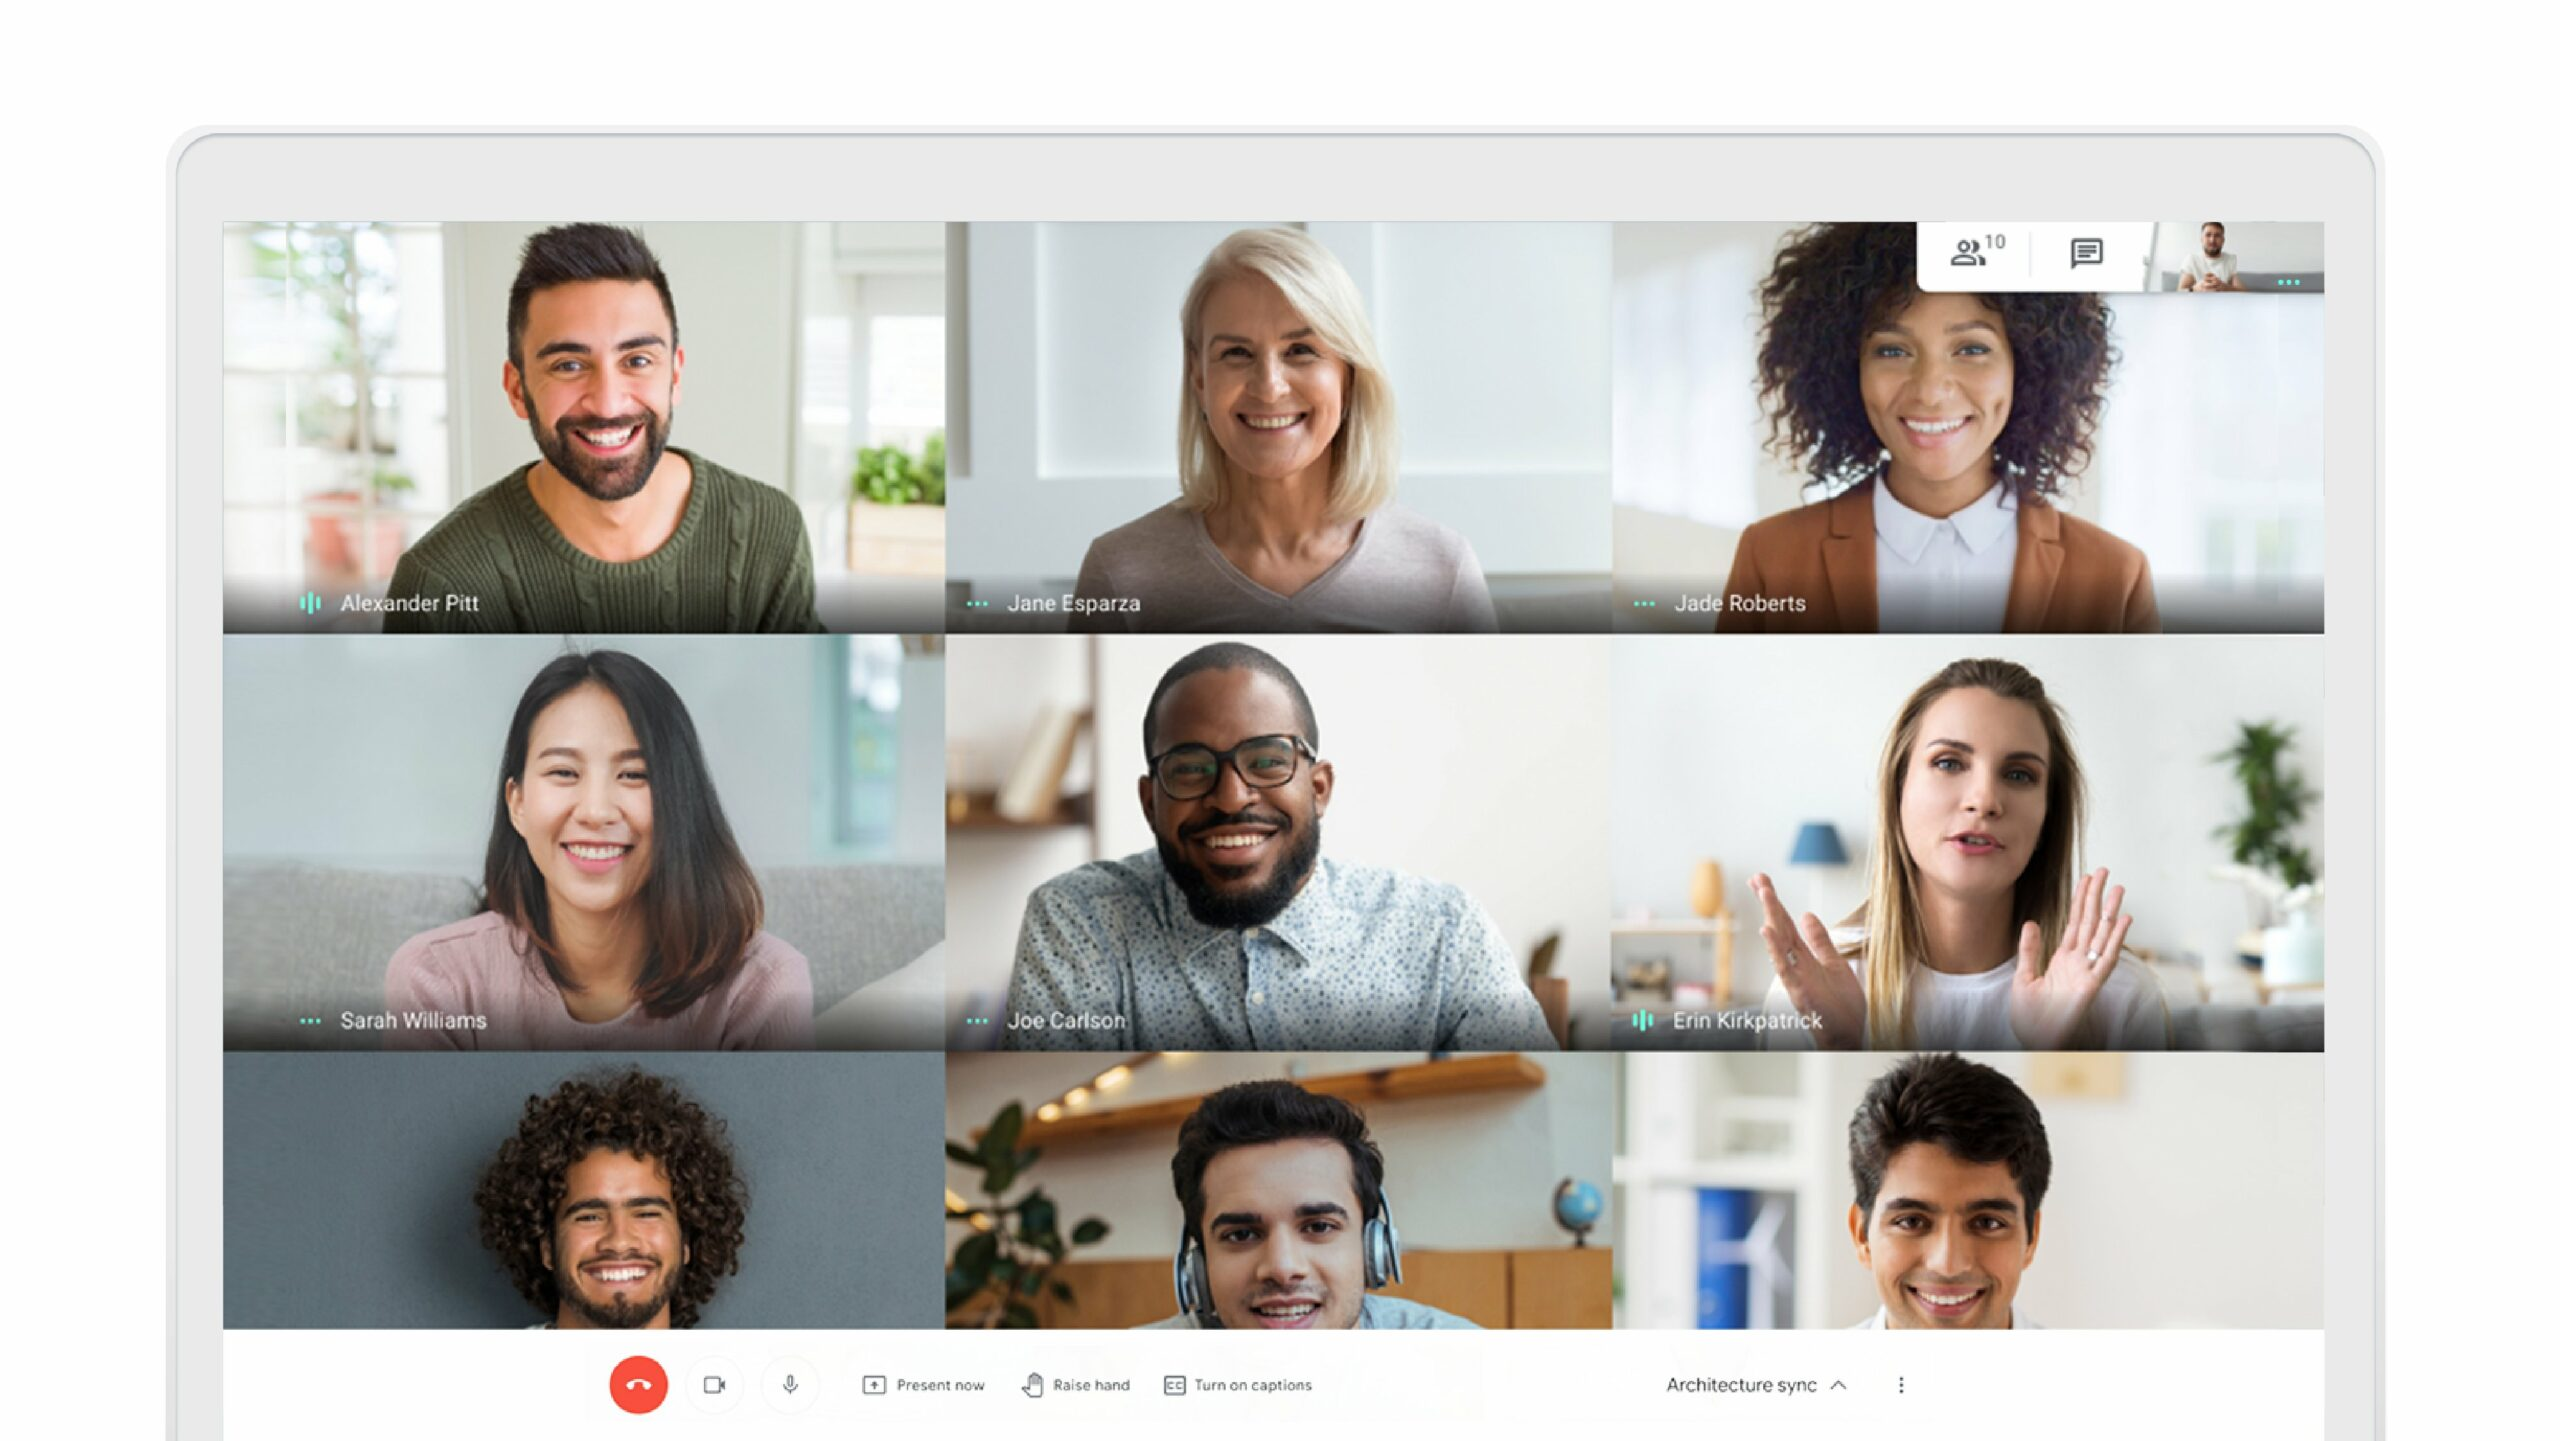 Google Meet free unlimited video calling extended till June